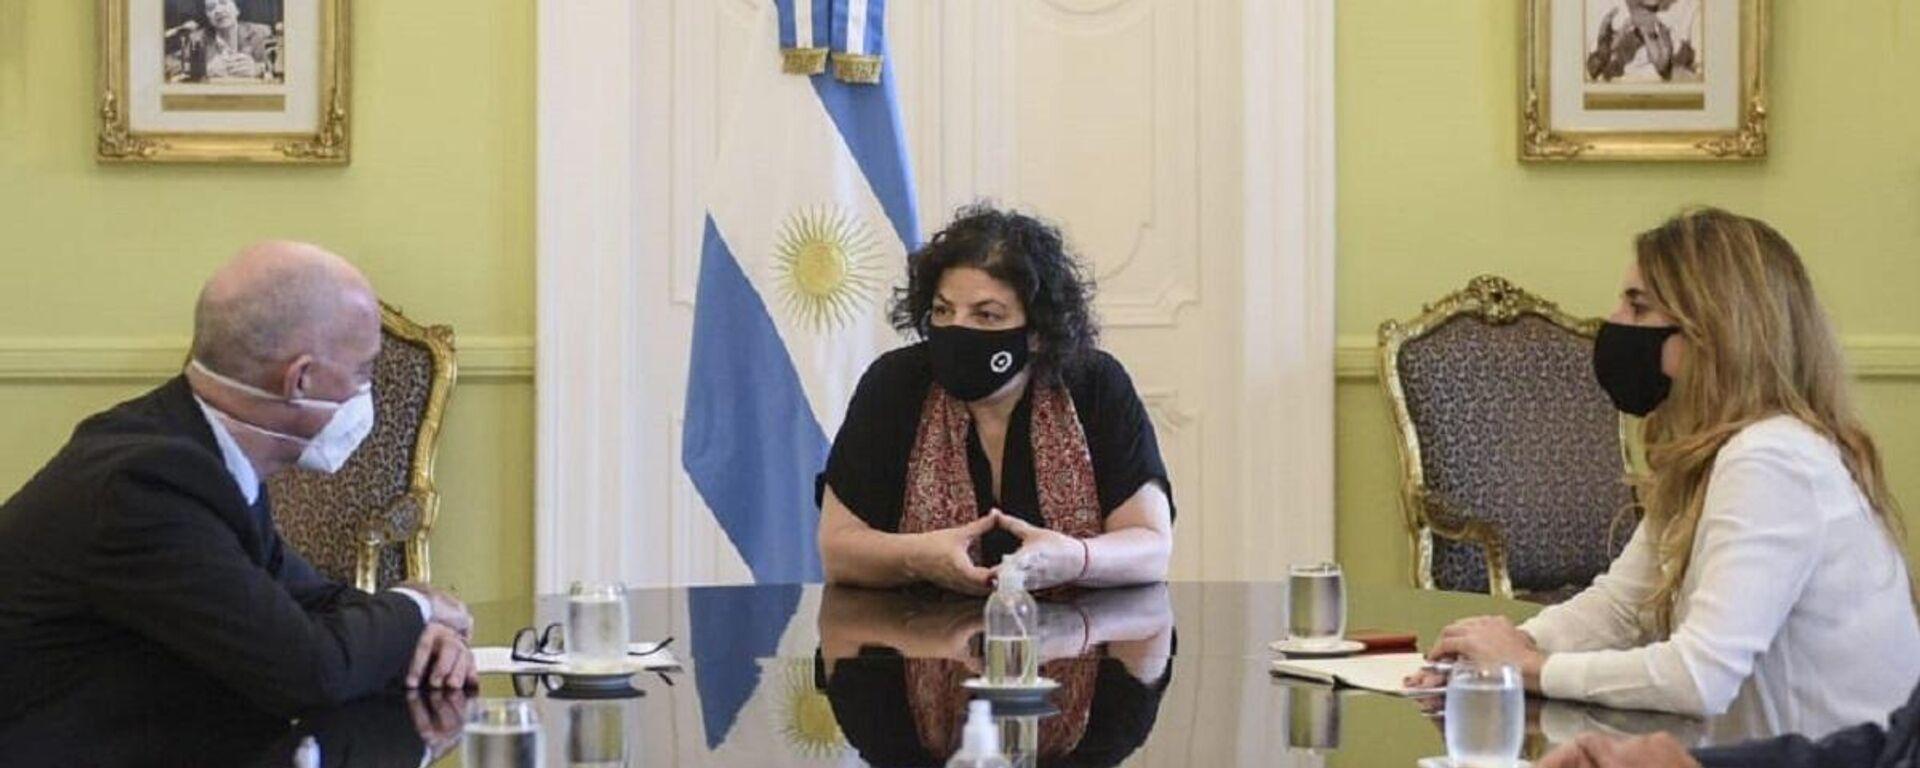 La ministra de Salud argentina, Carla Vizzotti (centro), y la asesora presidencial Cecilia Nicolini (derecha) - Sputnik Mundo, 1920, 03.05.2021